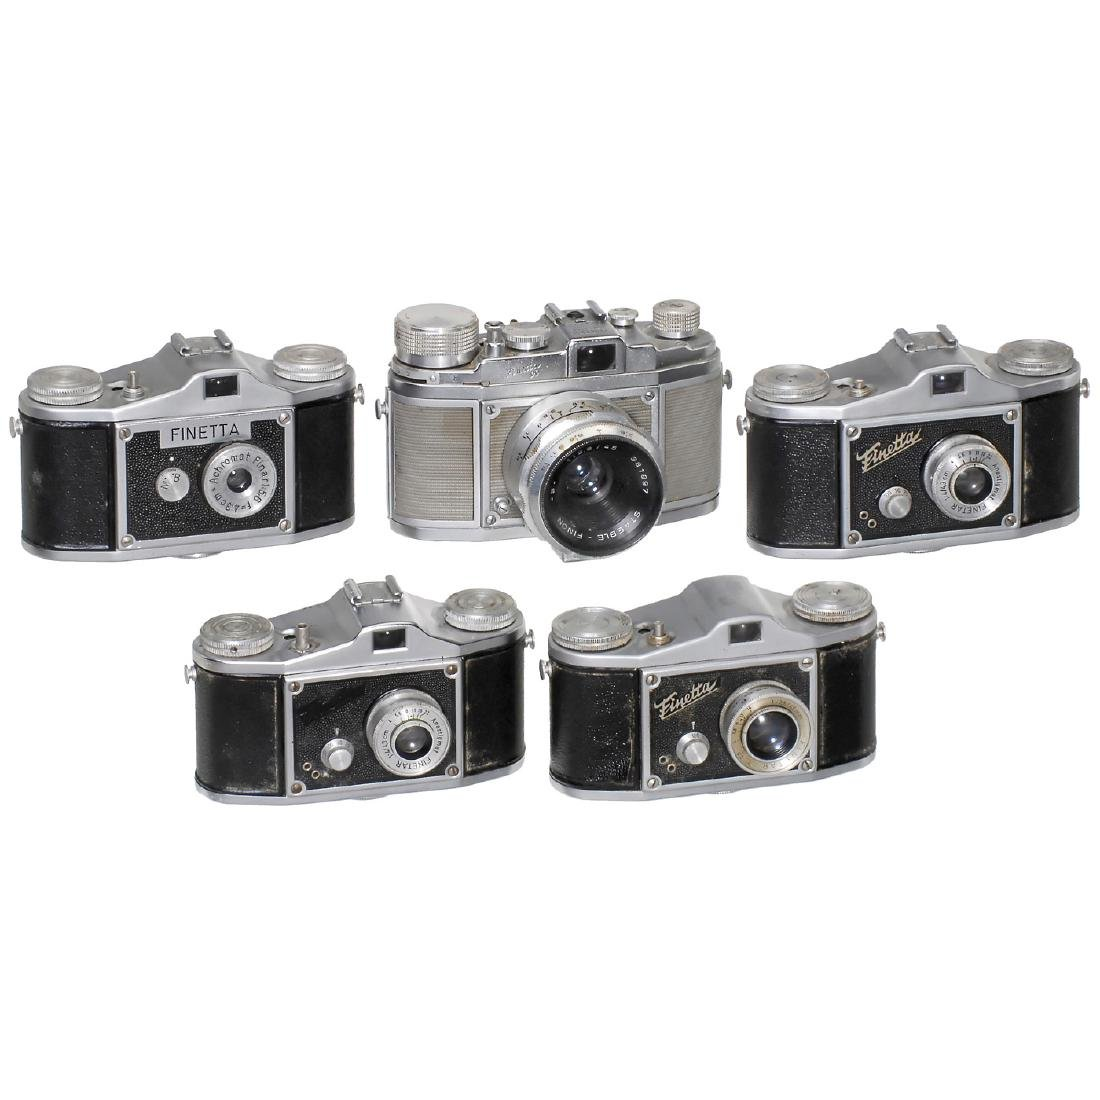 5 Finetta Cameras